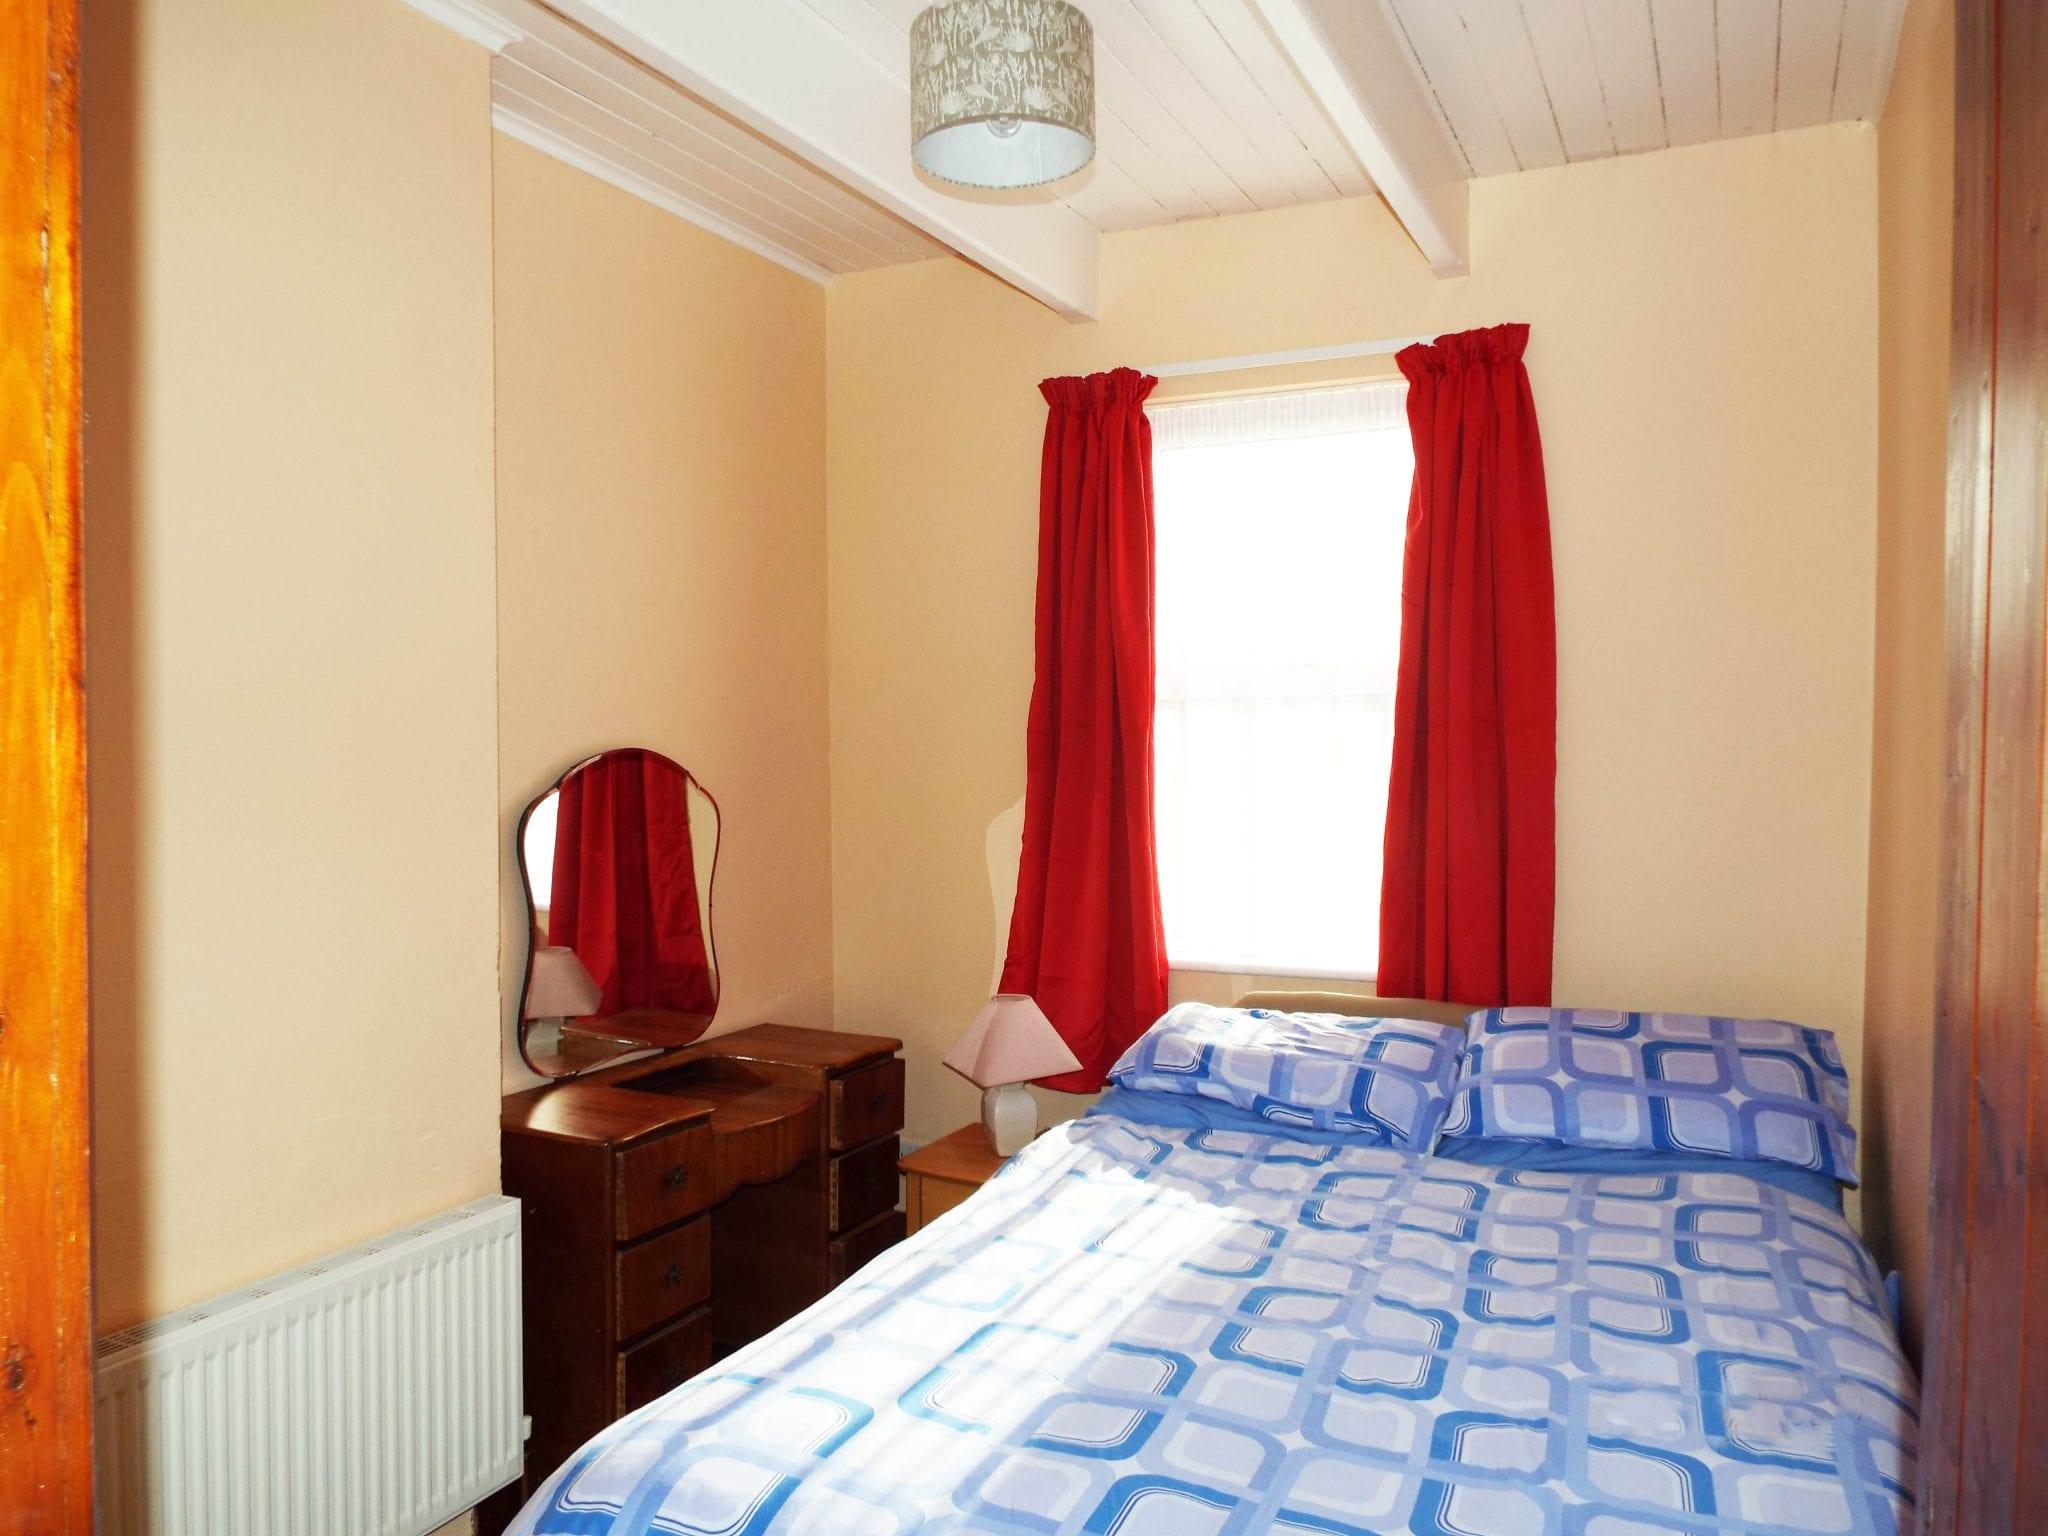 14 - bed 2 bright & smudge